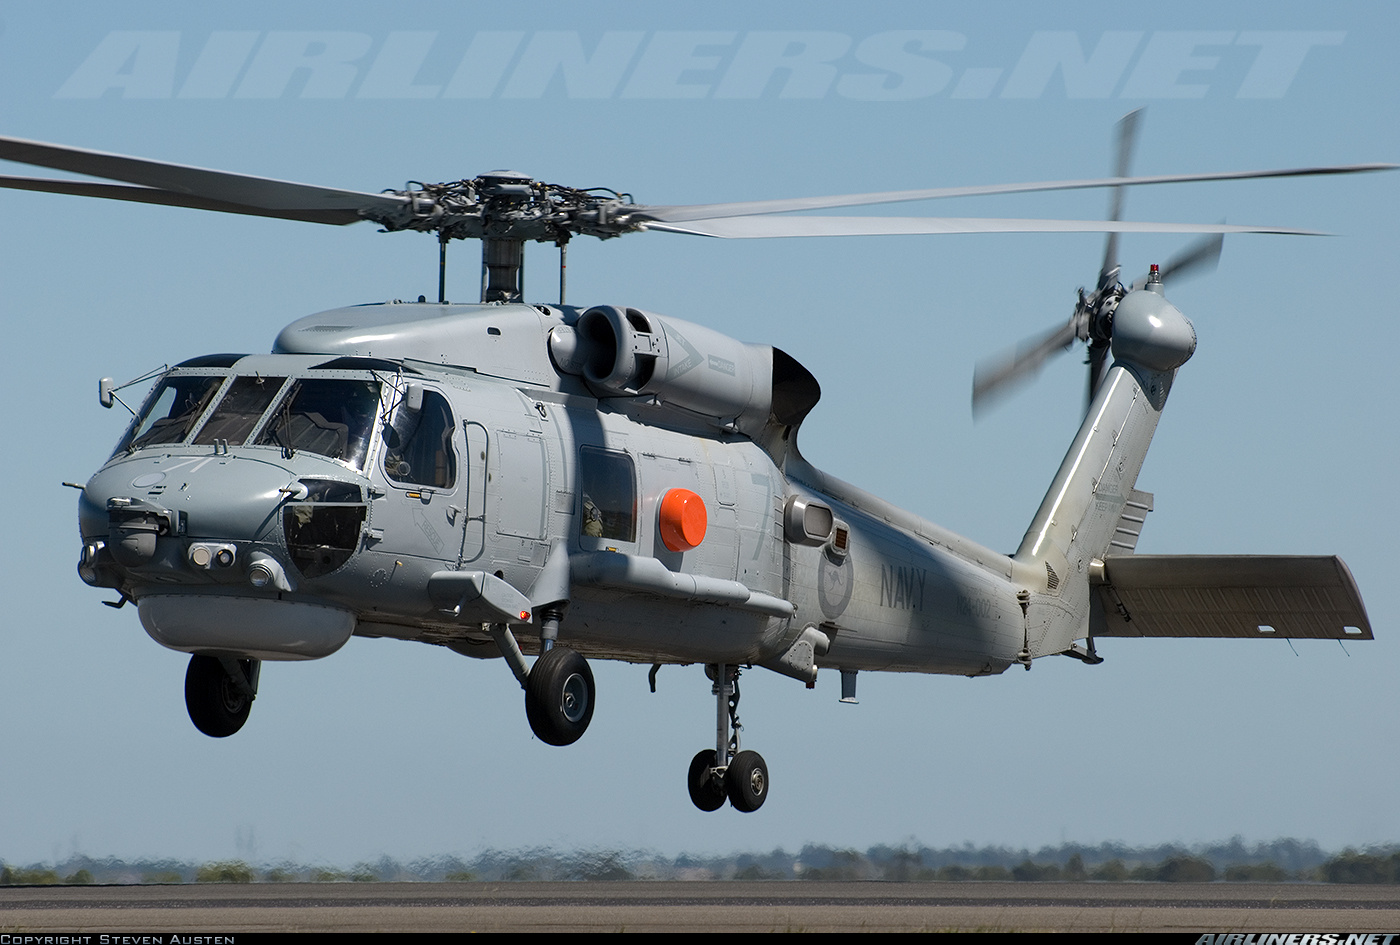 Вертолет S-70B-2 Seahawk ВМФ Австралии.